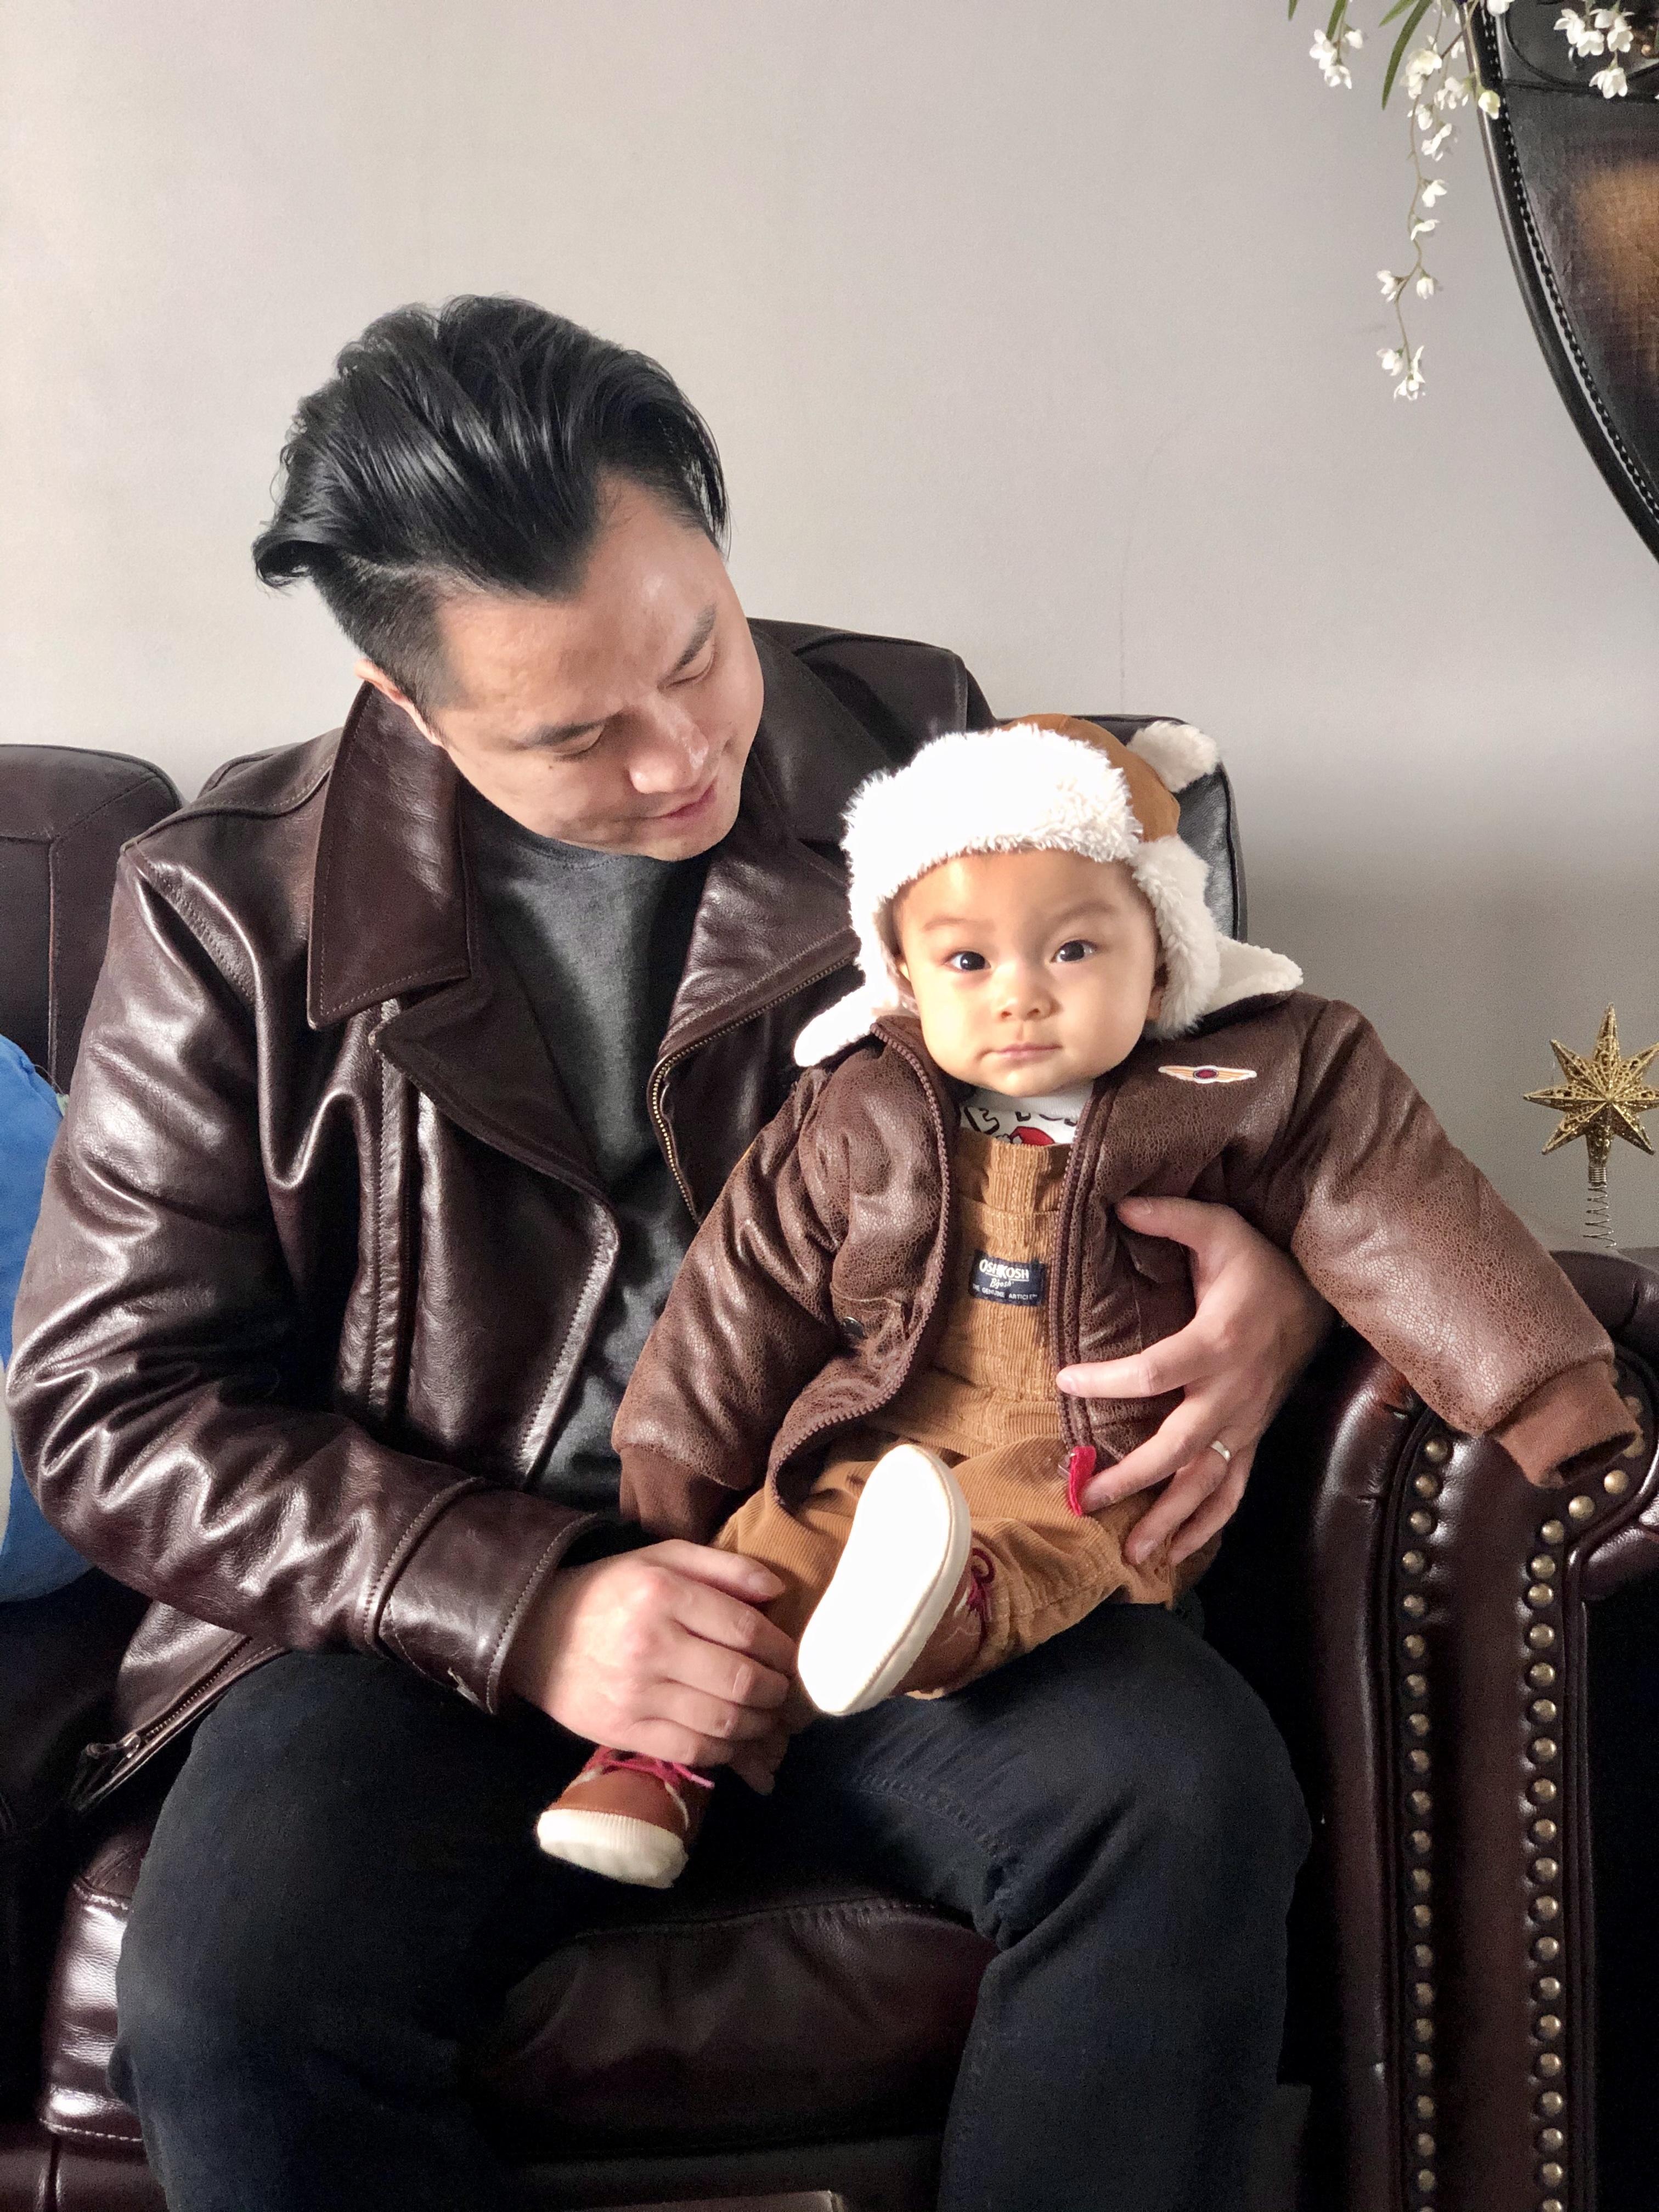 Aero Hooch Hauler customer with baby.jpg